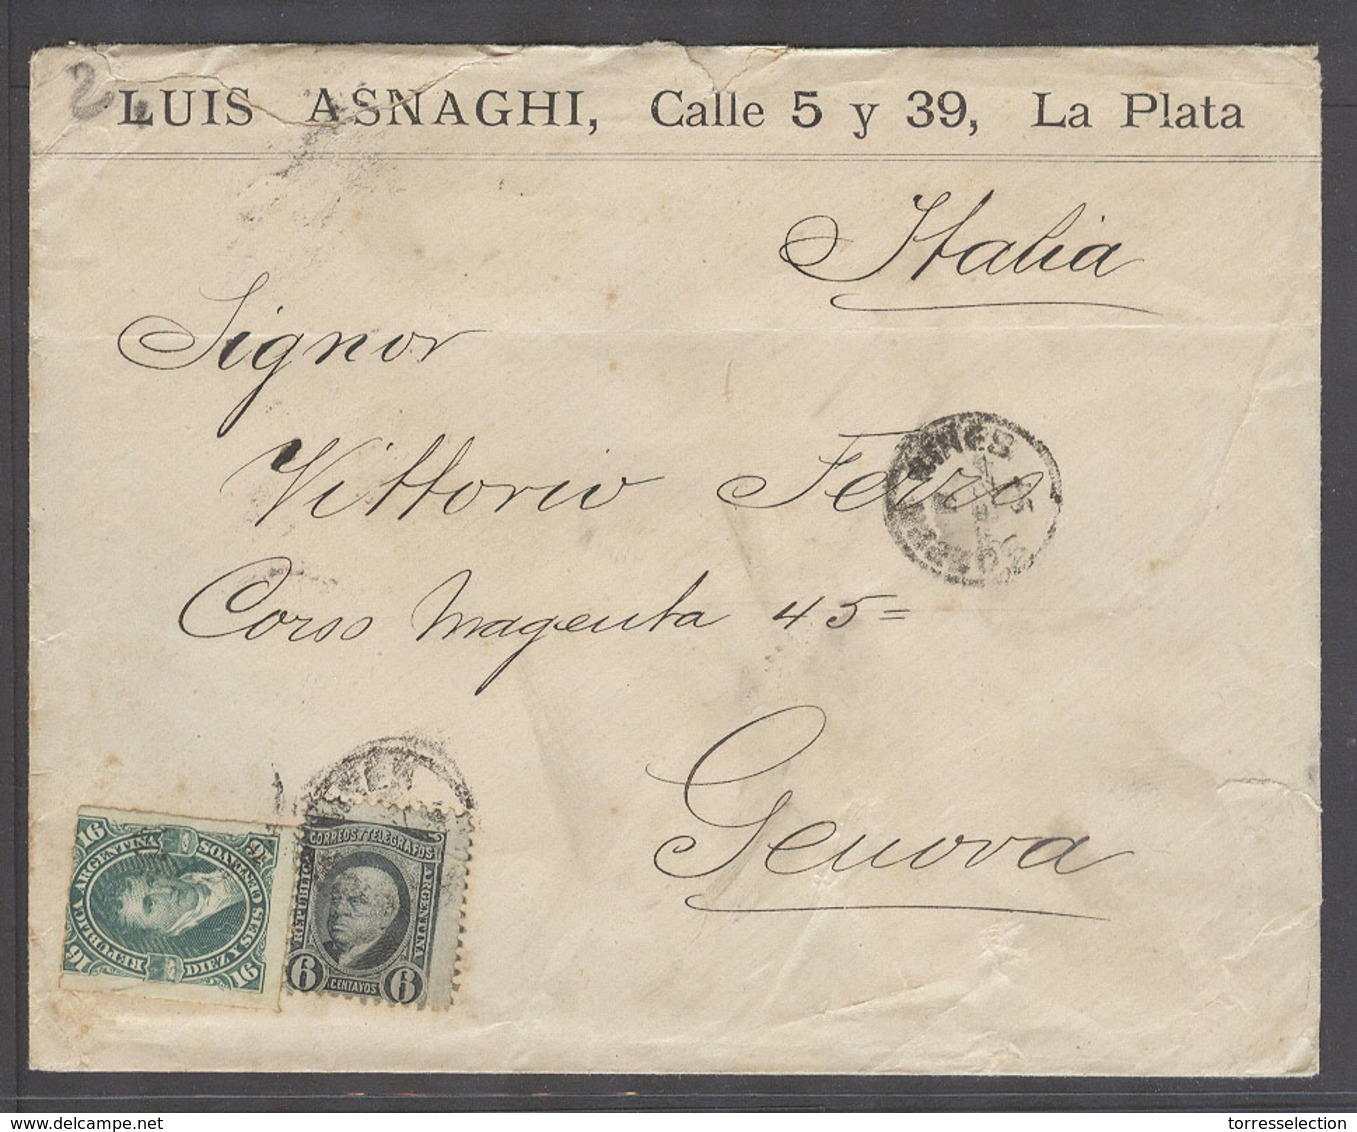 ARGENTINA. 1891 (24 Feb). La Plata, BA - Italy, Genoa (17 March). Fkd Env Bearing 16c Green ABN Perce 6c Mixed Issues Cd - Argentine